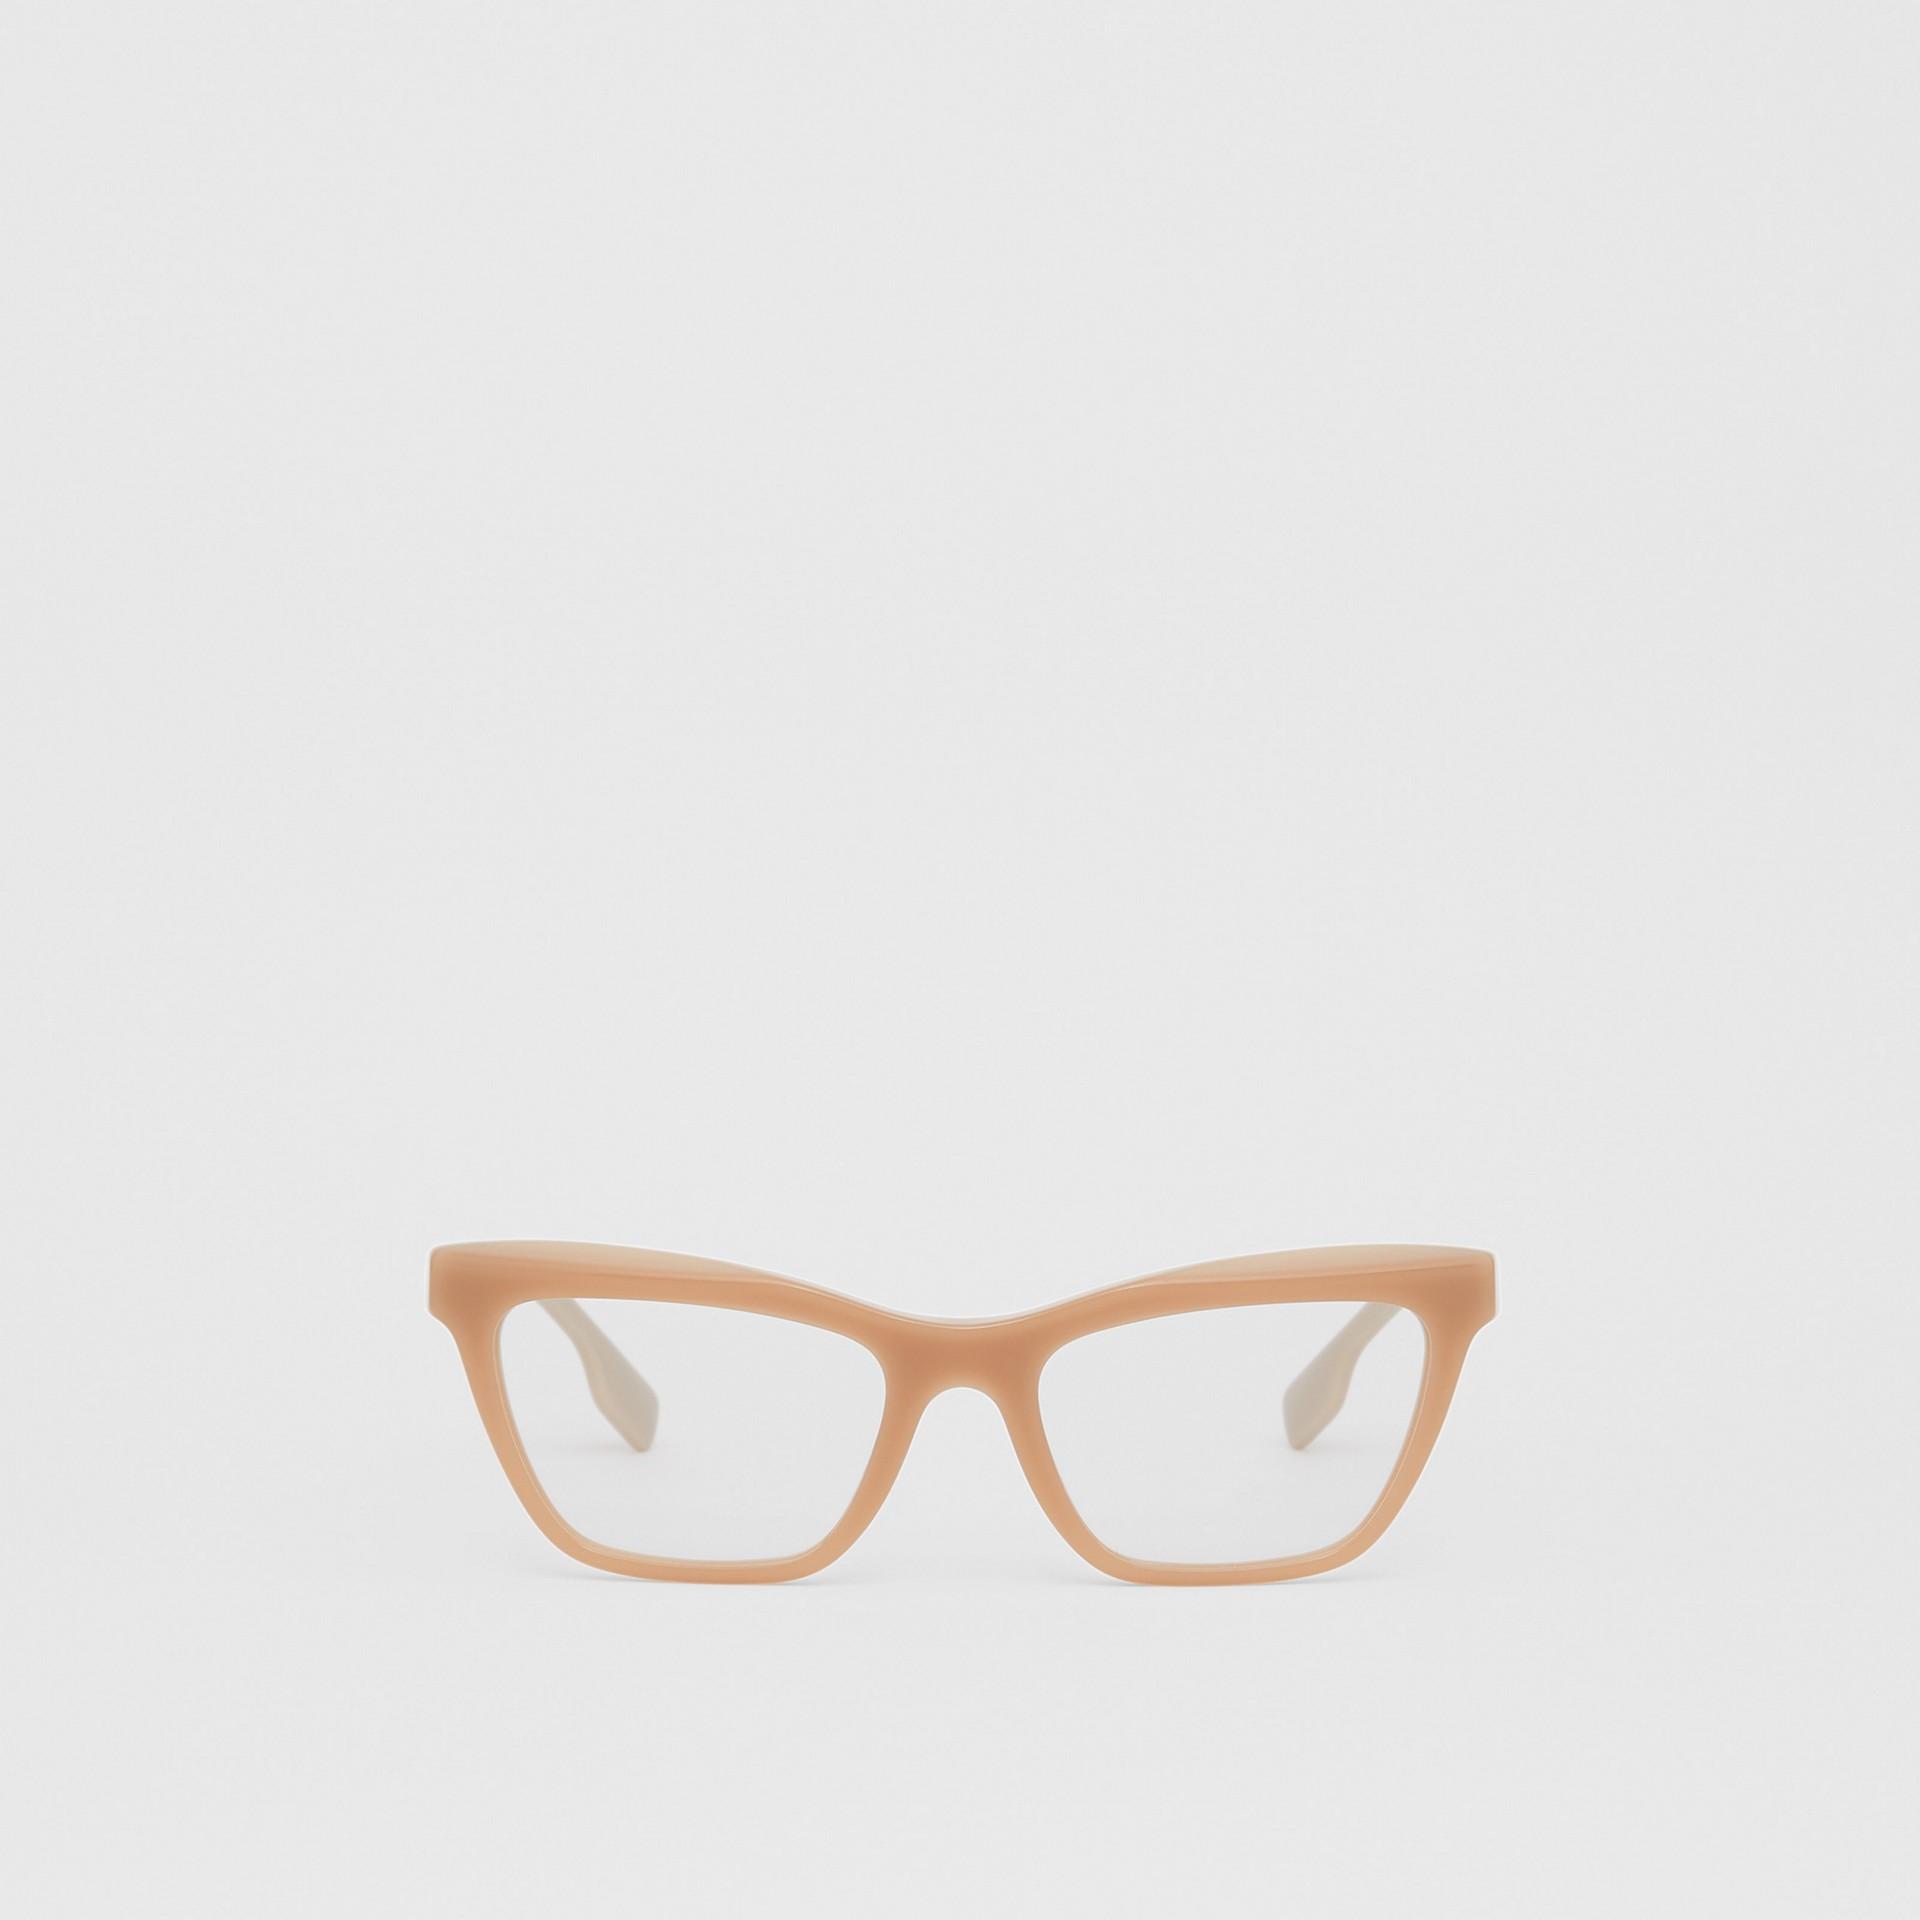 Rectangular Optical Frames in Peach - Women | Burberry - gallery image 0